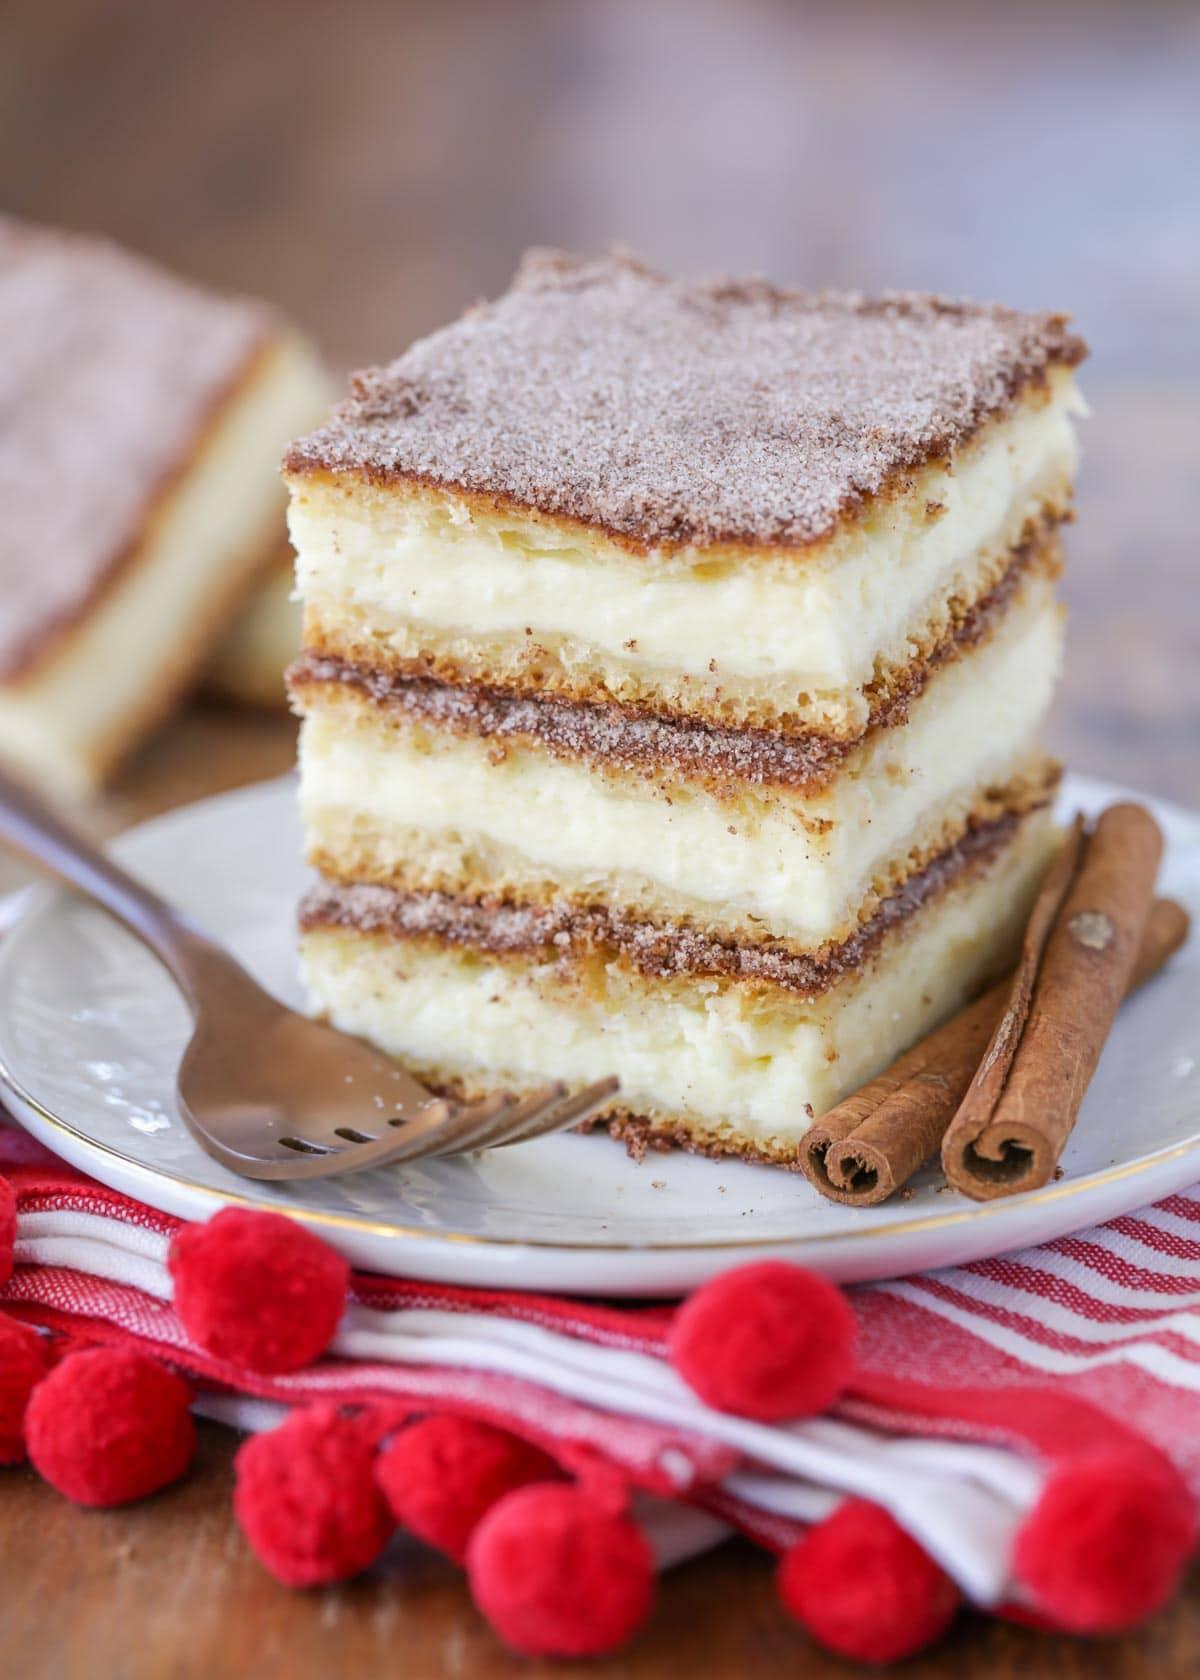 Stack of cut churro cheesecake bars on a white plate.